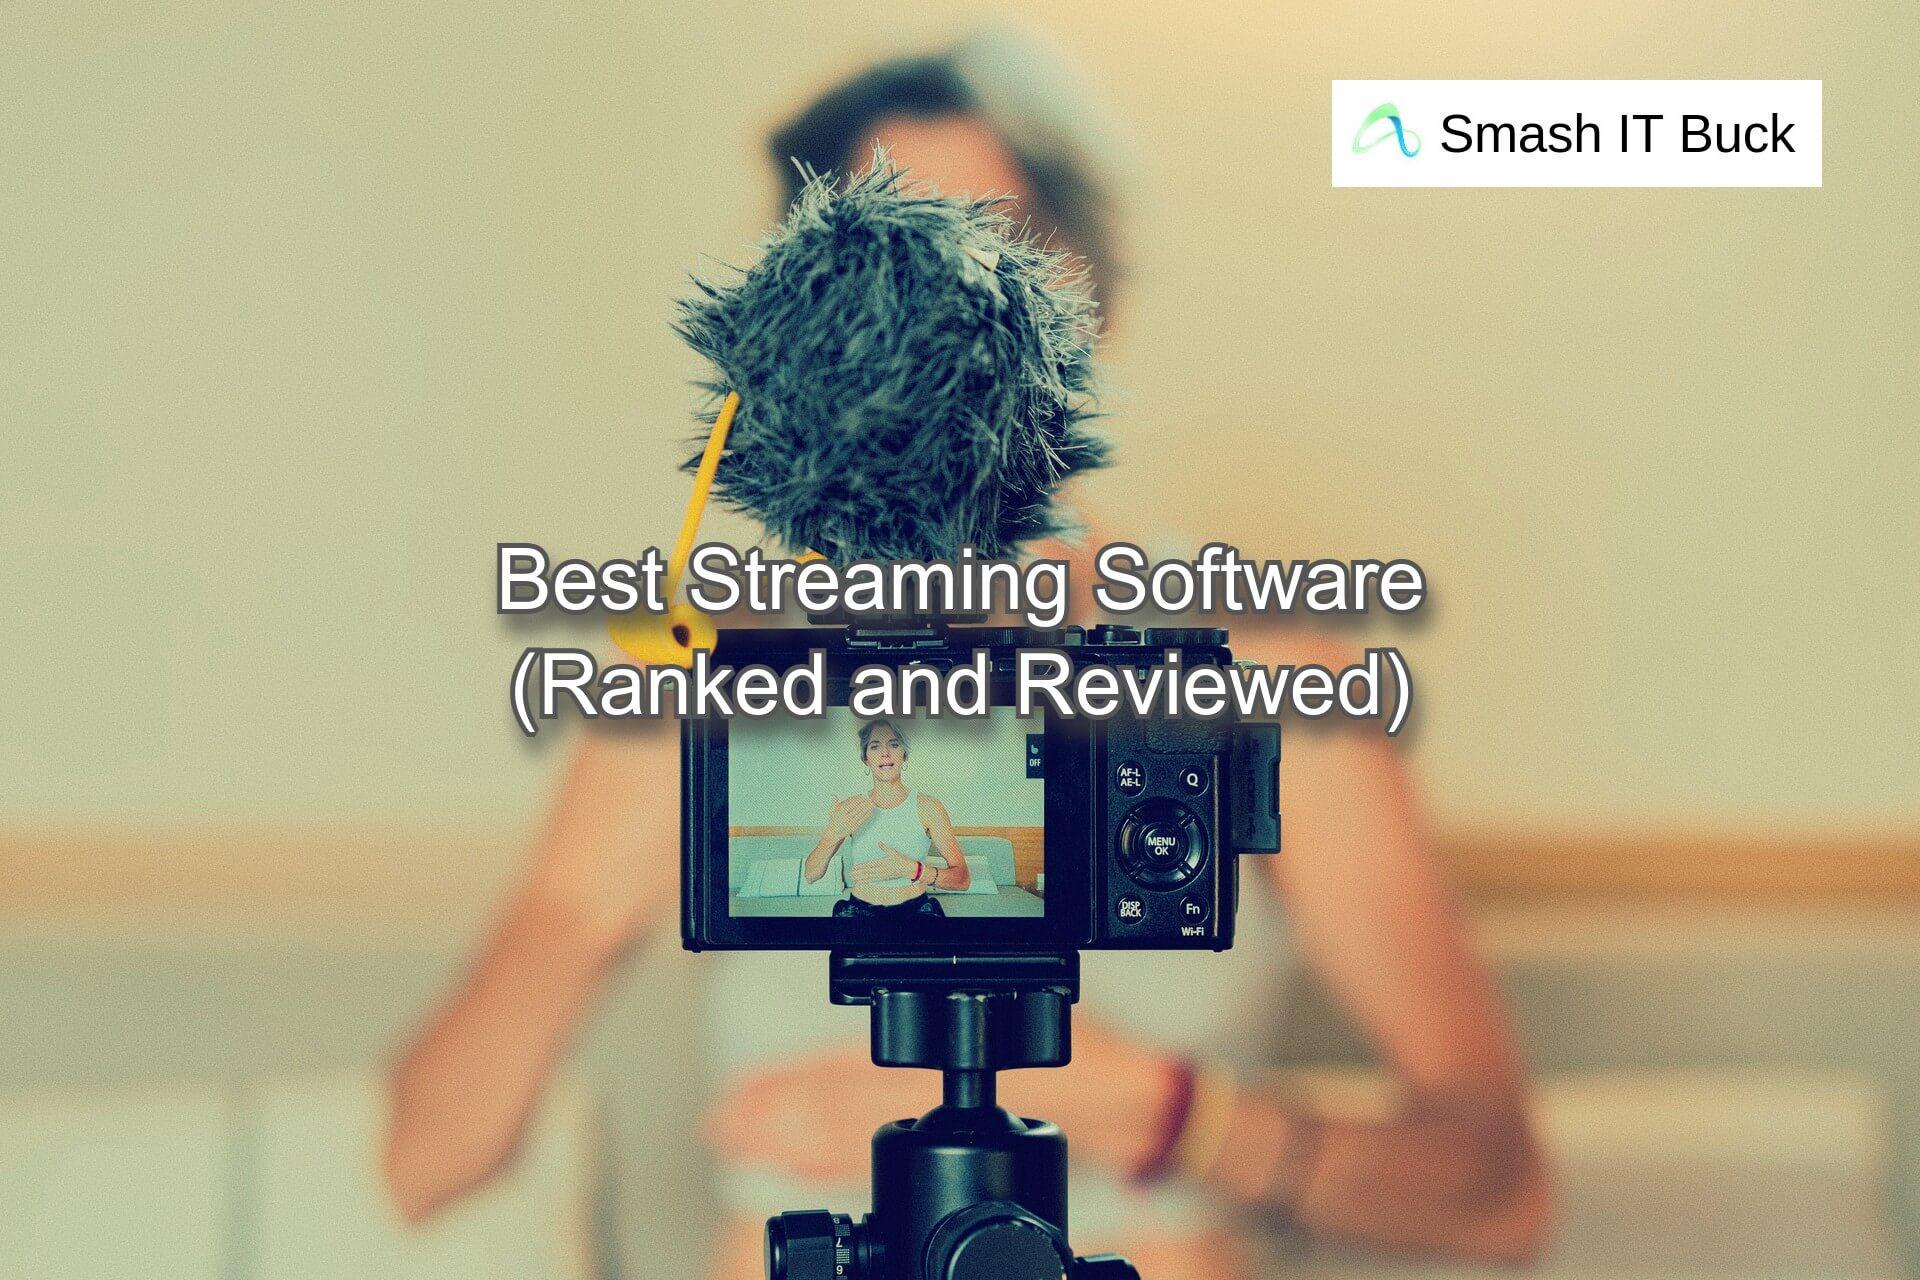 Best Streaming Software for Social Media in 2021